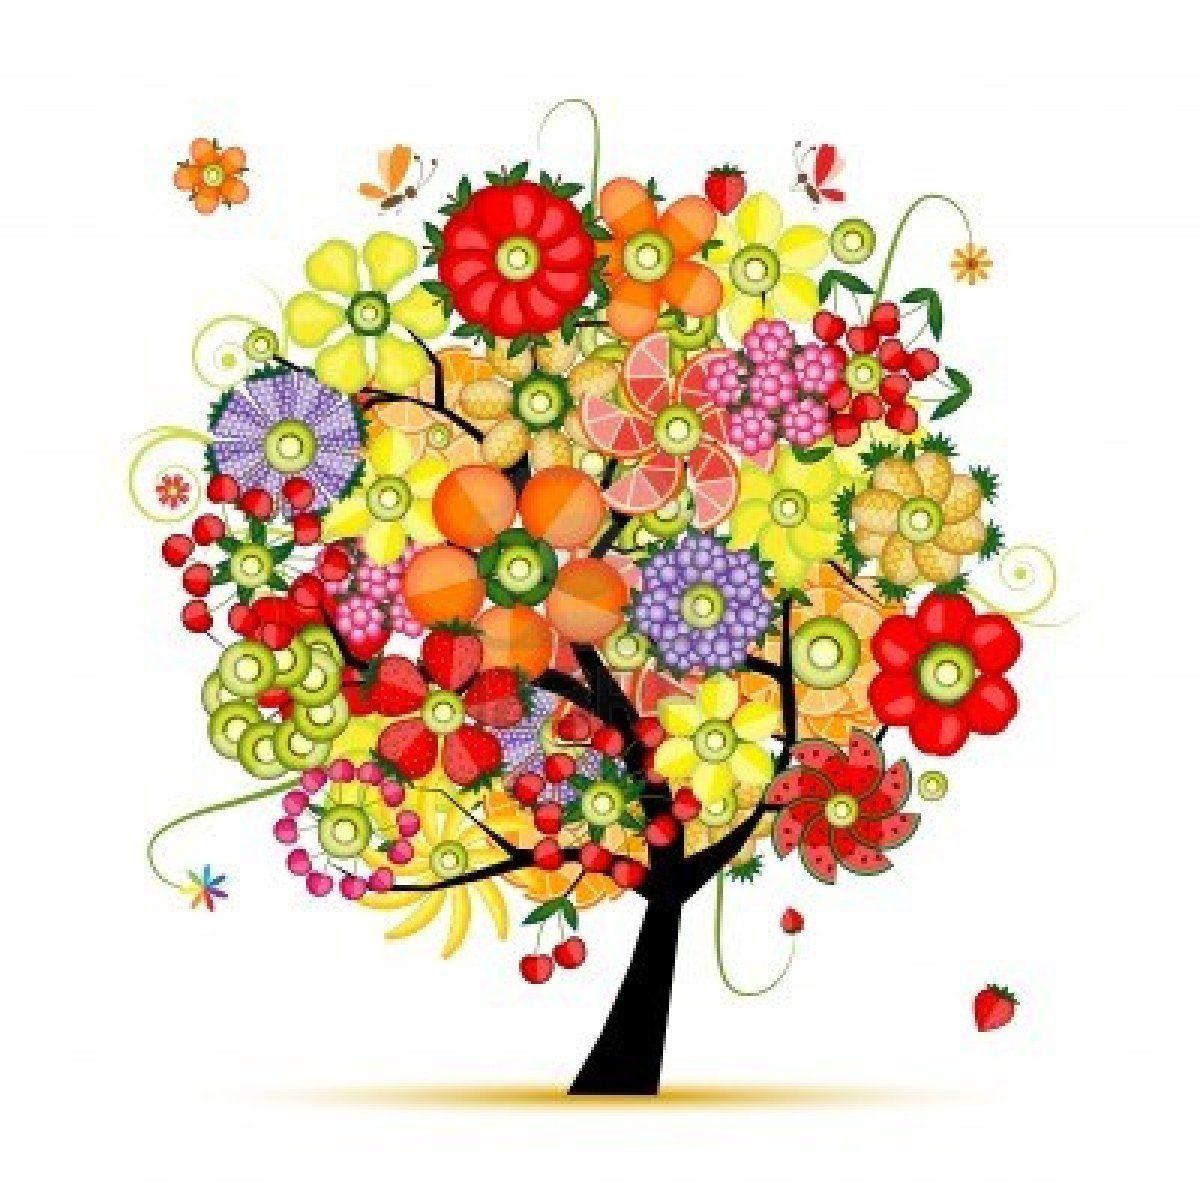 Flores Para Imprimir A Color Buscar Con Google Arte De Arboles Pintura Floral Flores Pintadas